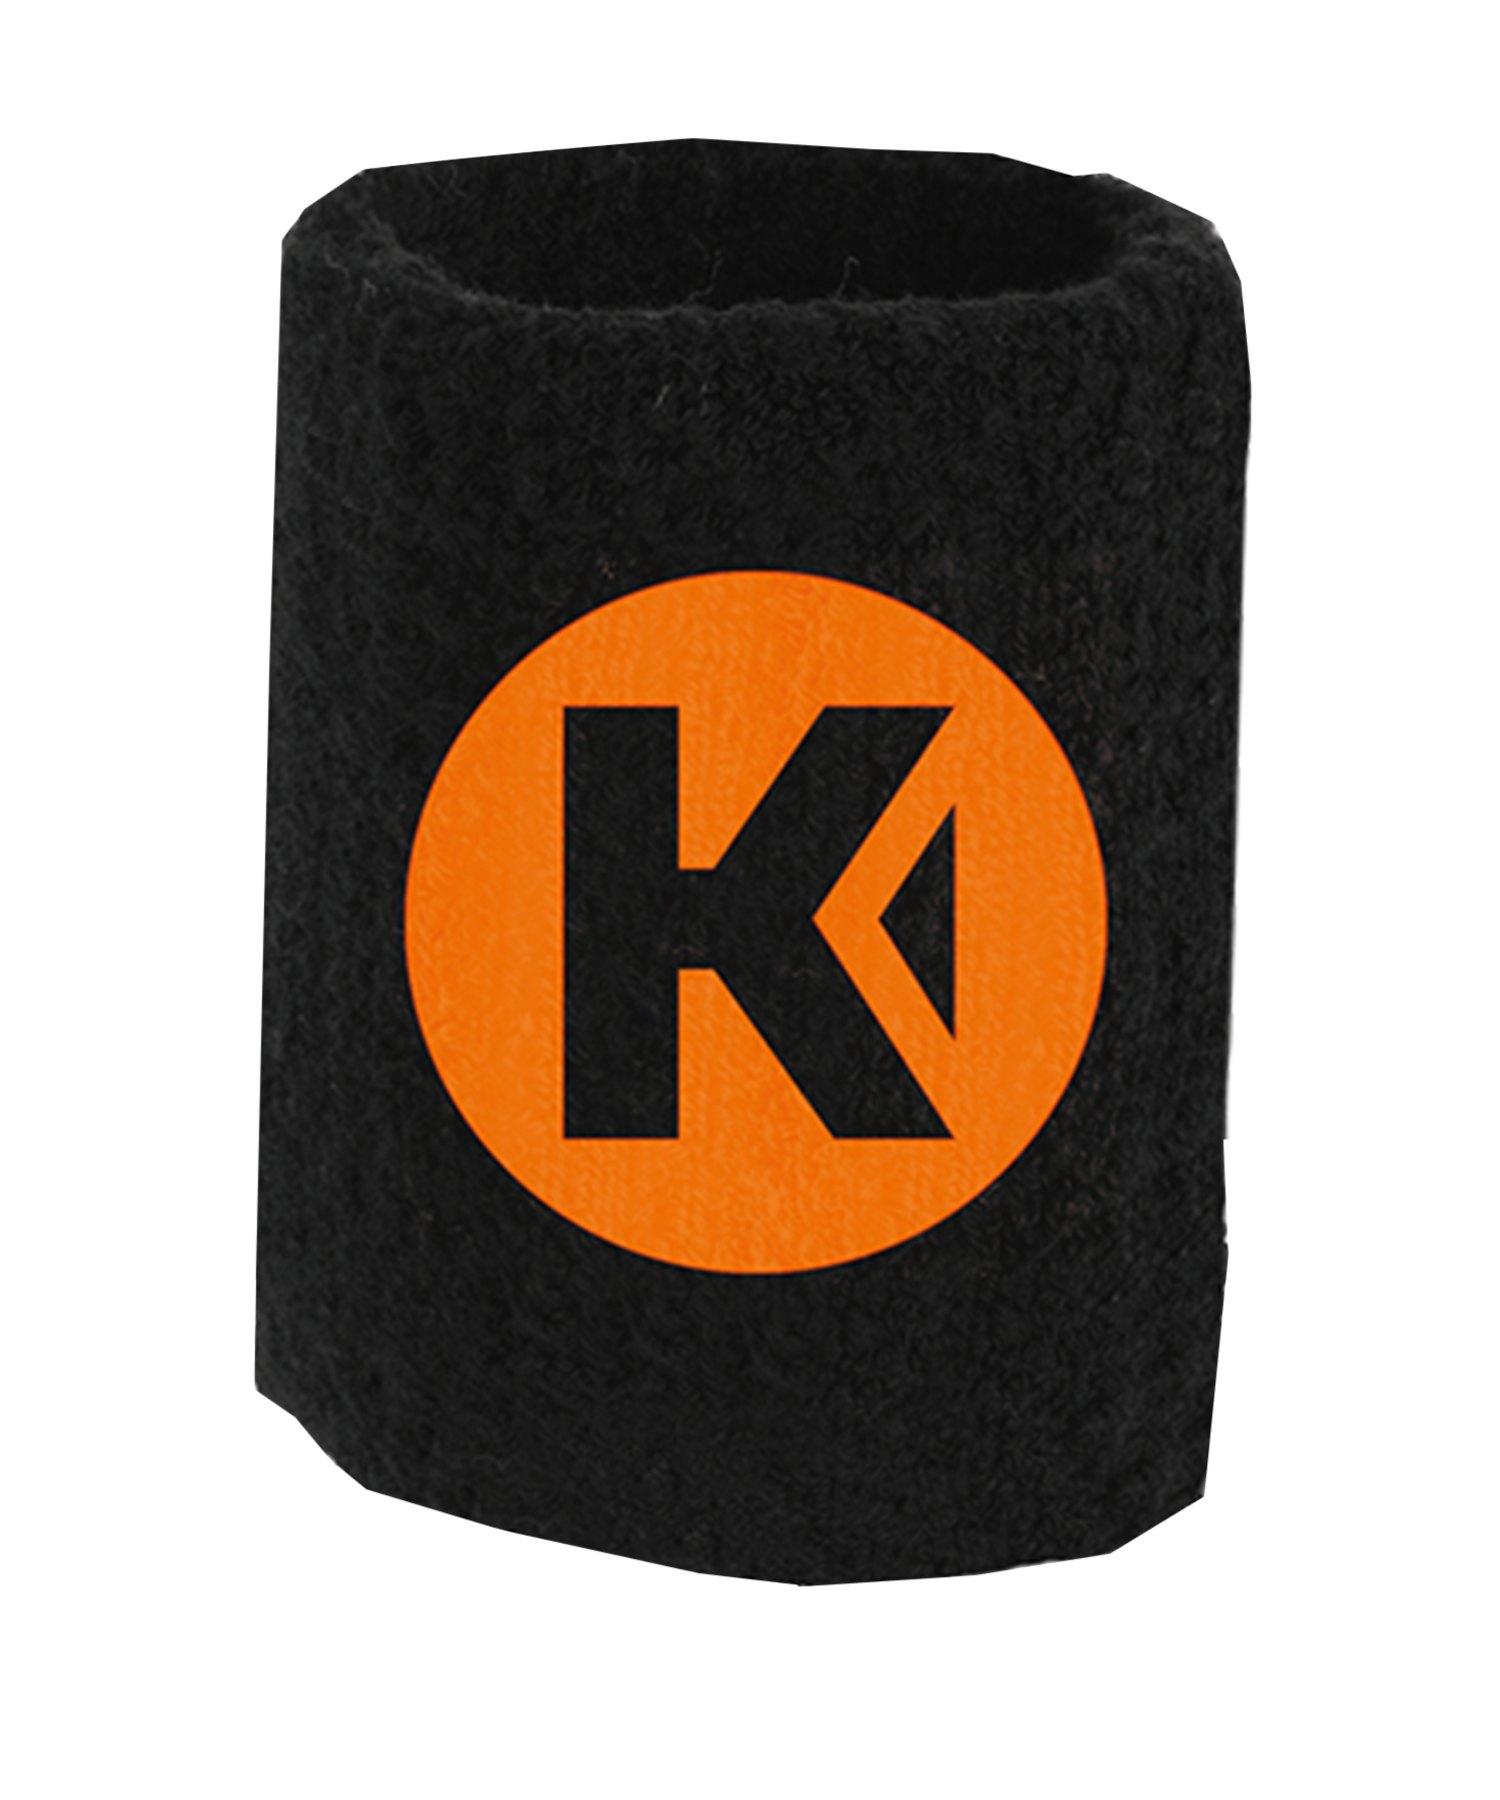 Kempa Laganda Schweißband Schwarz F01 - schwarz